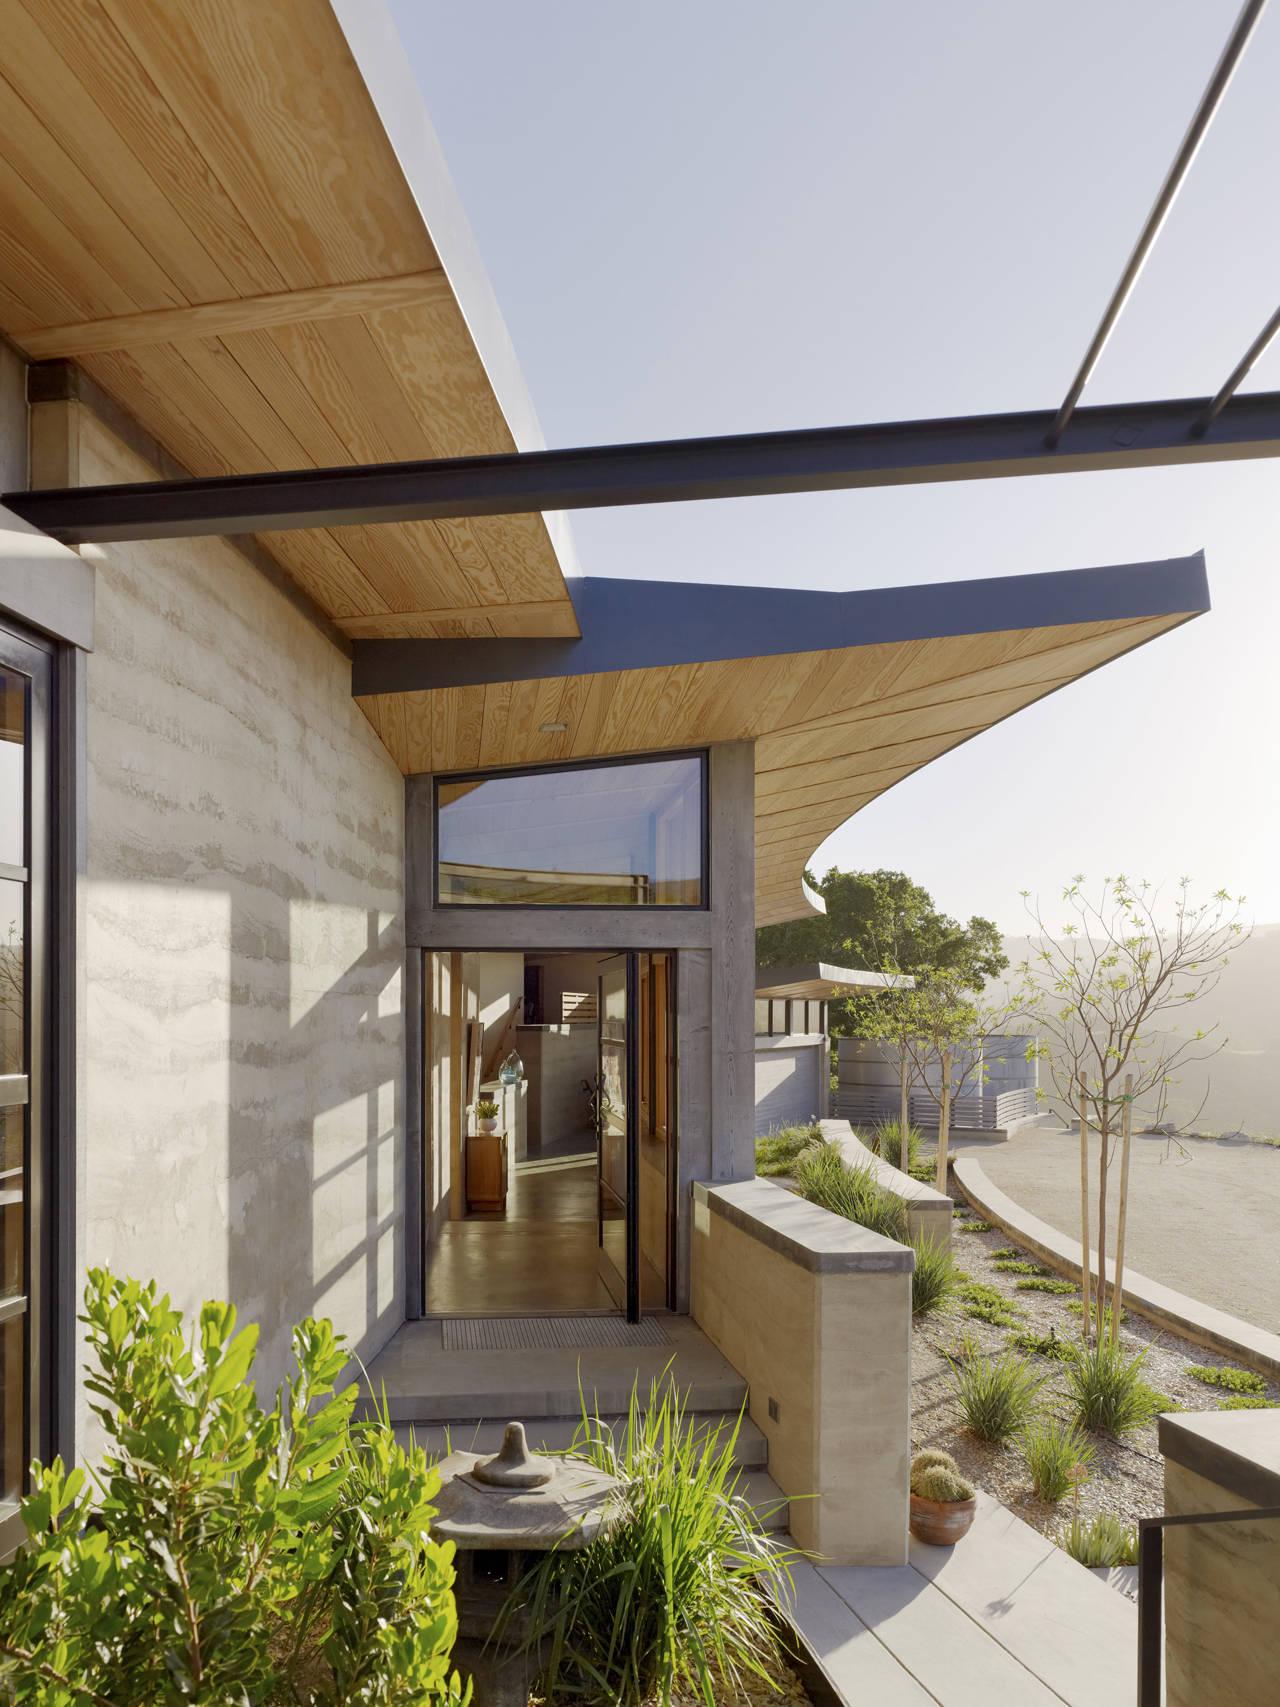 Glass Front Door, Caterpillar House in Carmel, California by Feldman Architecture